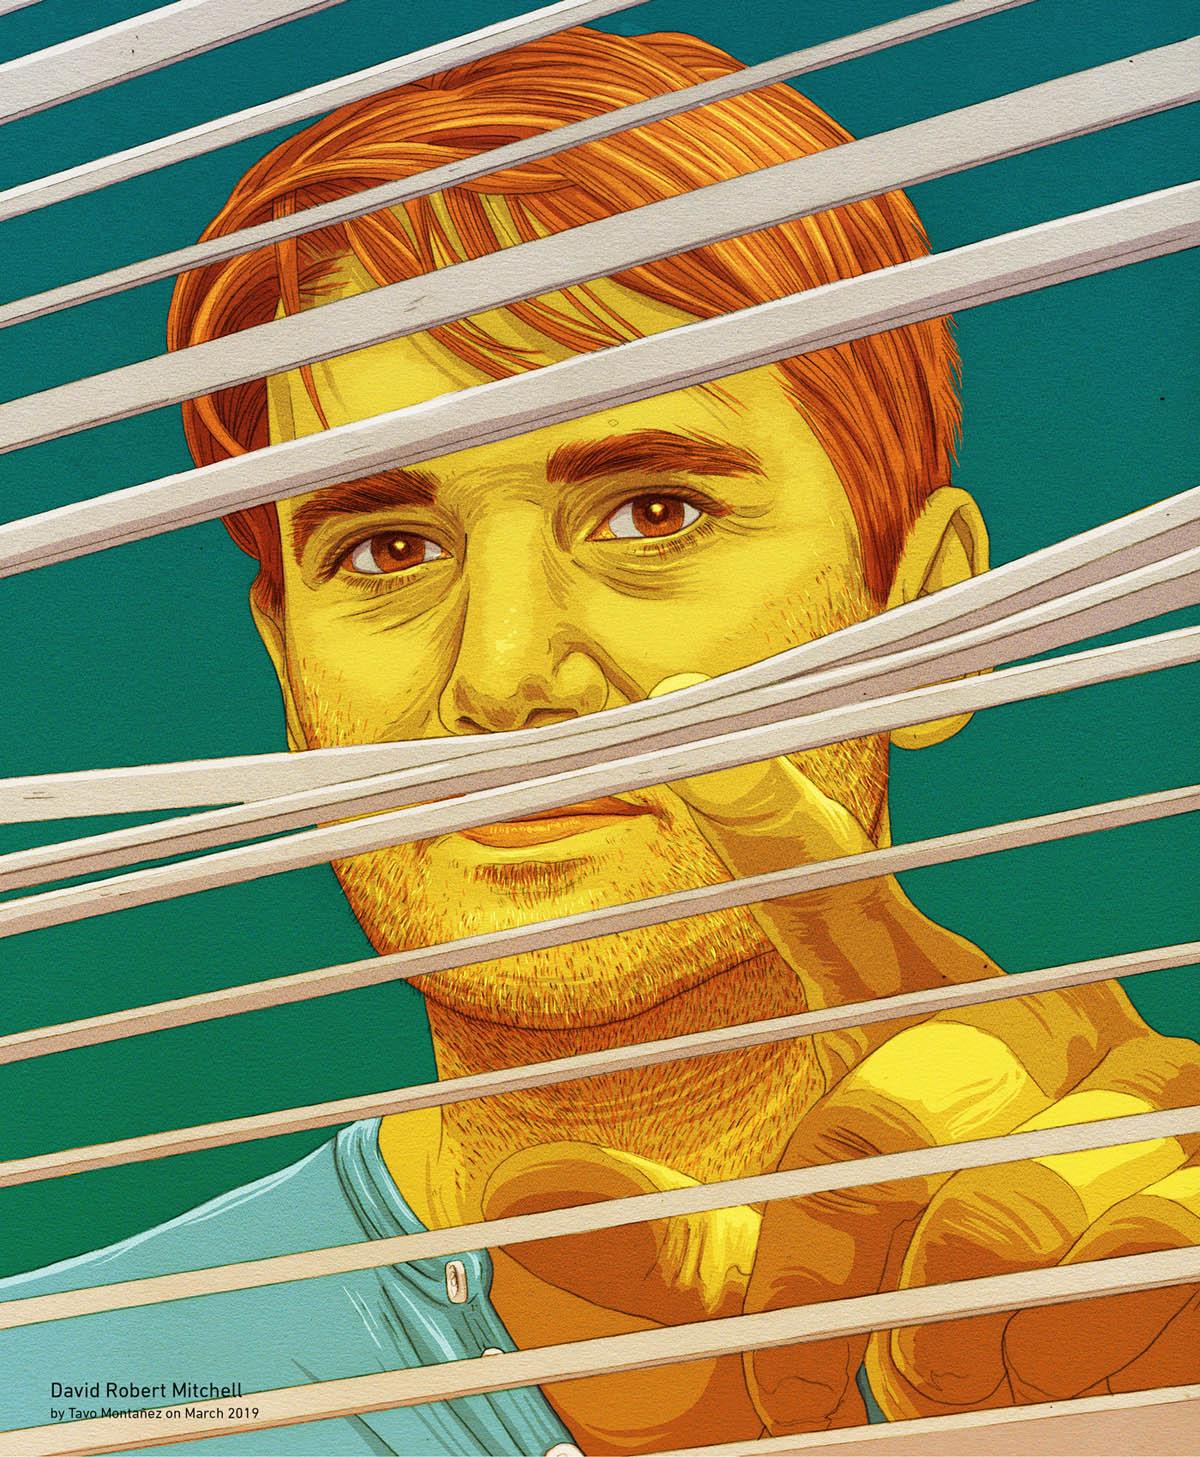 digital art illustration david robert mitchell by tavo montanez